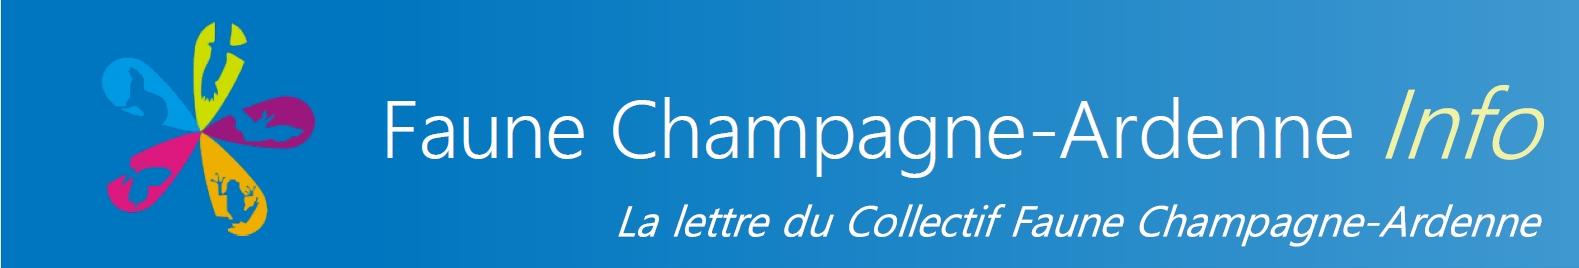 https://cdnfiles2.biolovision.net/www.faune-champagne-ardenne.org/userfiles/LettredinfoFCA/bandeaupresentationFauneChampagne-ArdenneInfo2.jpg